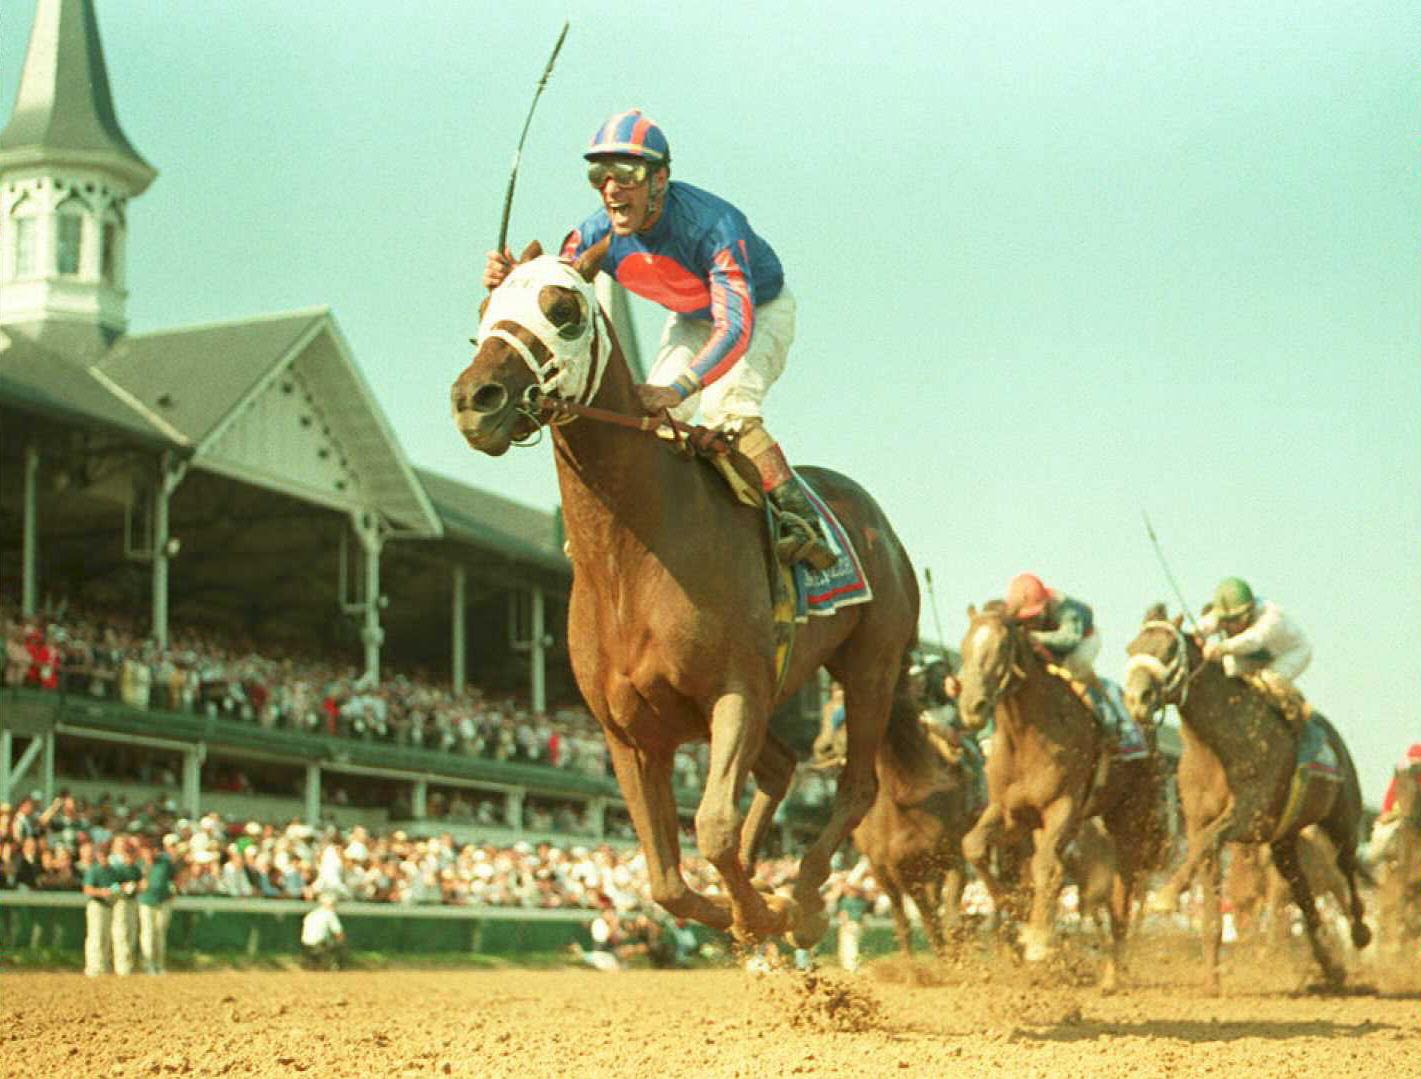 Jockey Gary Stevens(L) rides Thunder Gulch horse